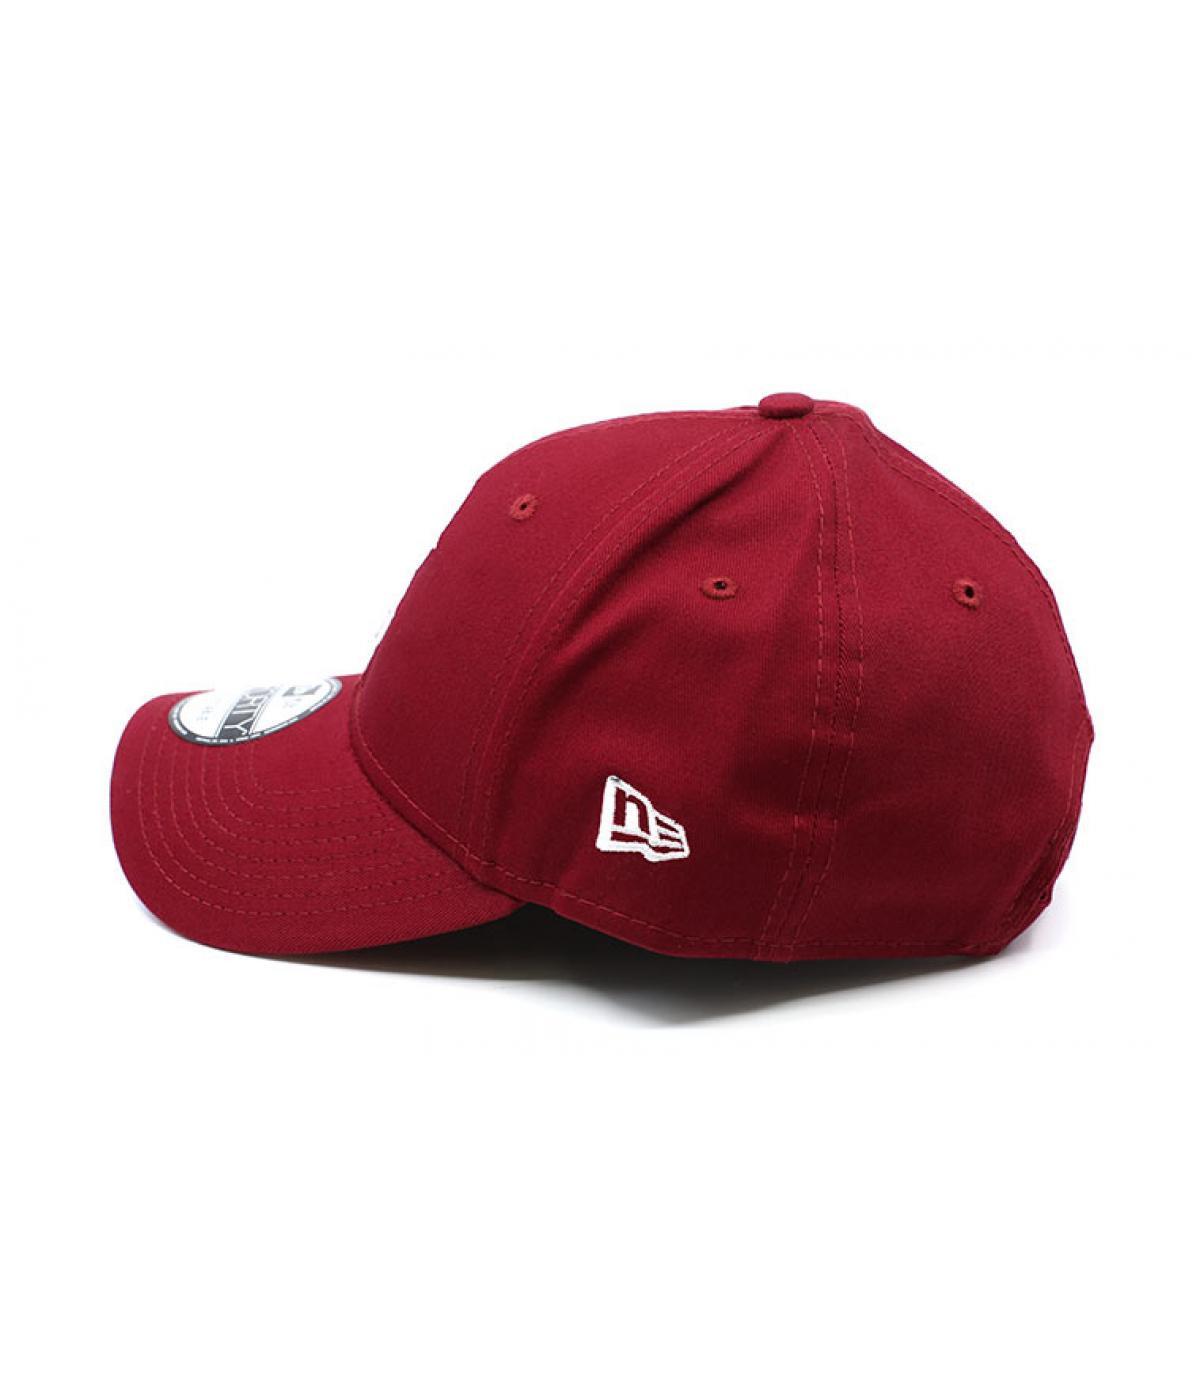 Dettagli League Ess 9Forty Boston cardinal - image 4